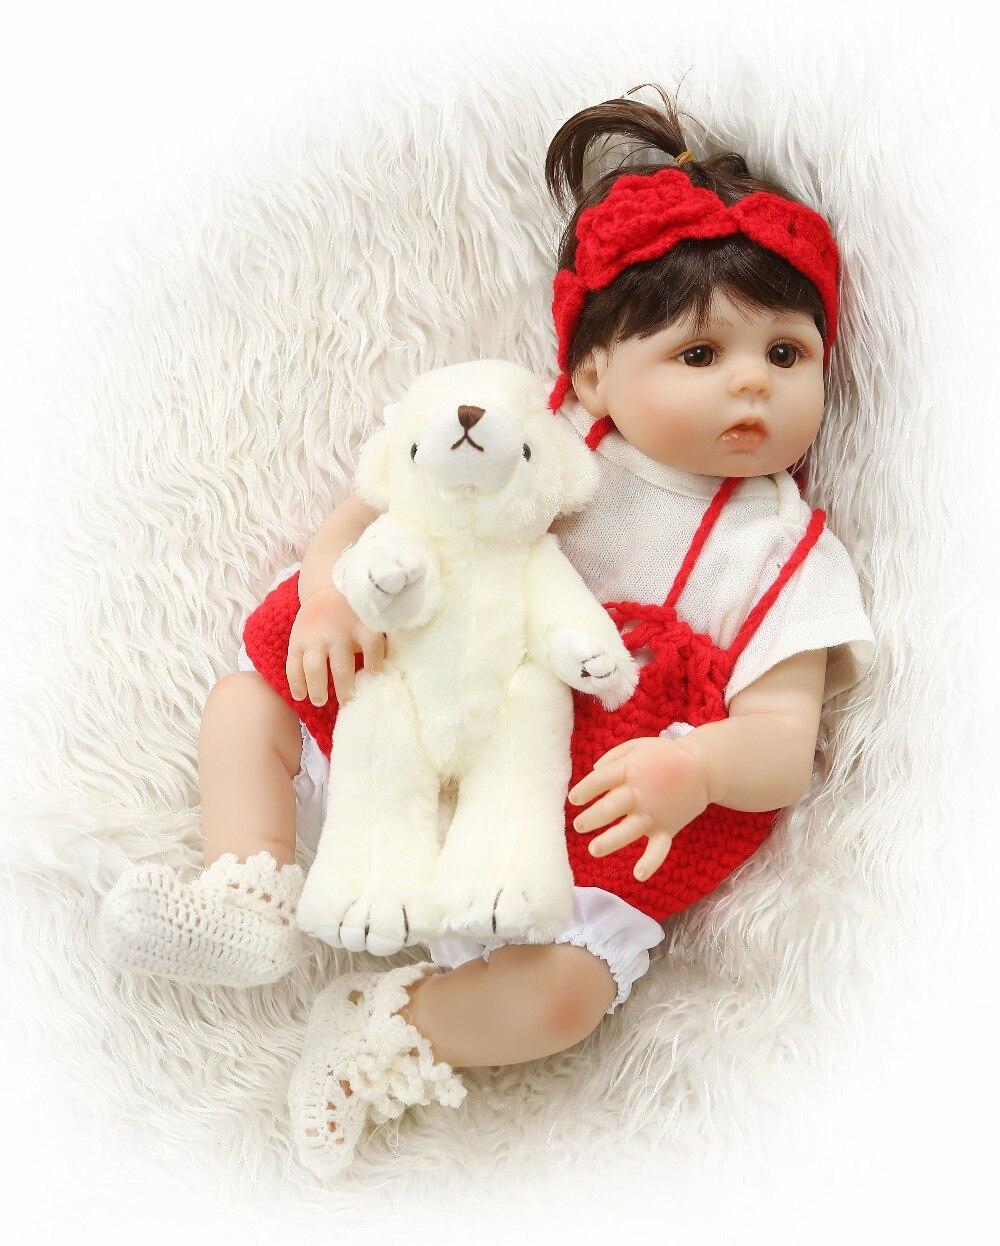 Silicone Corpo Reborn Baby Girl  Doll Toys 1948cm Vinyl Newborn Princess bebes reborn bonecas Bathe Toys doll giftsSilicone Corpo Reborn Baby Girl  Doll Toys 1948cm Vinyl Newborn Princess bebes reborn bonecas Bathe Toys doll gifts